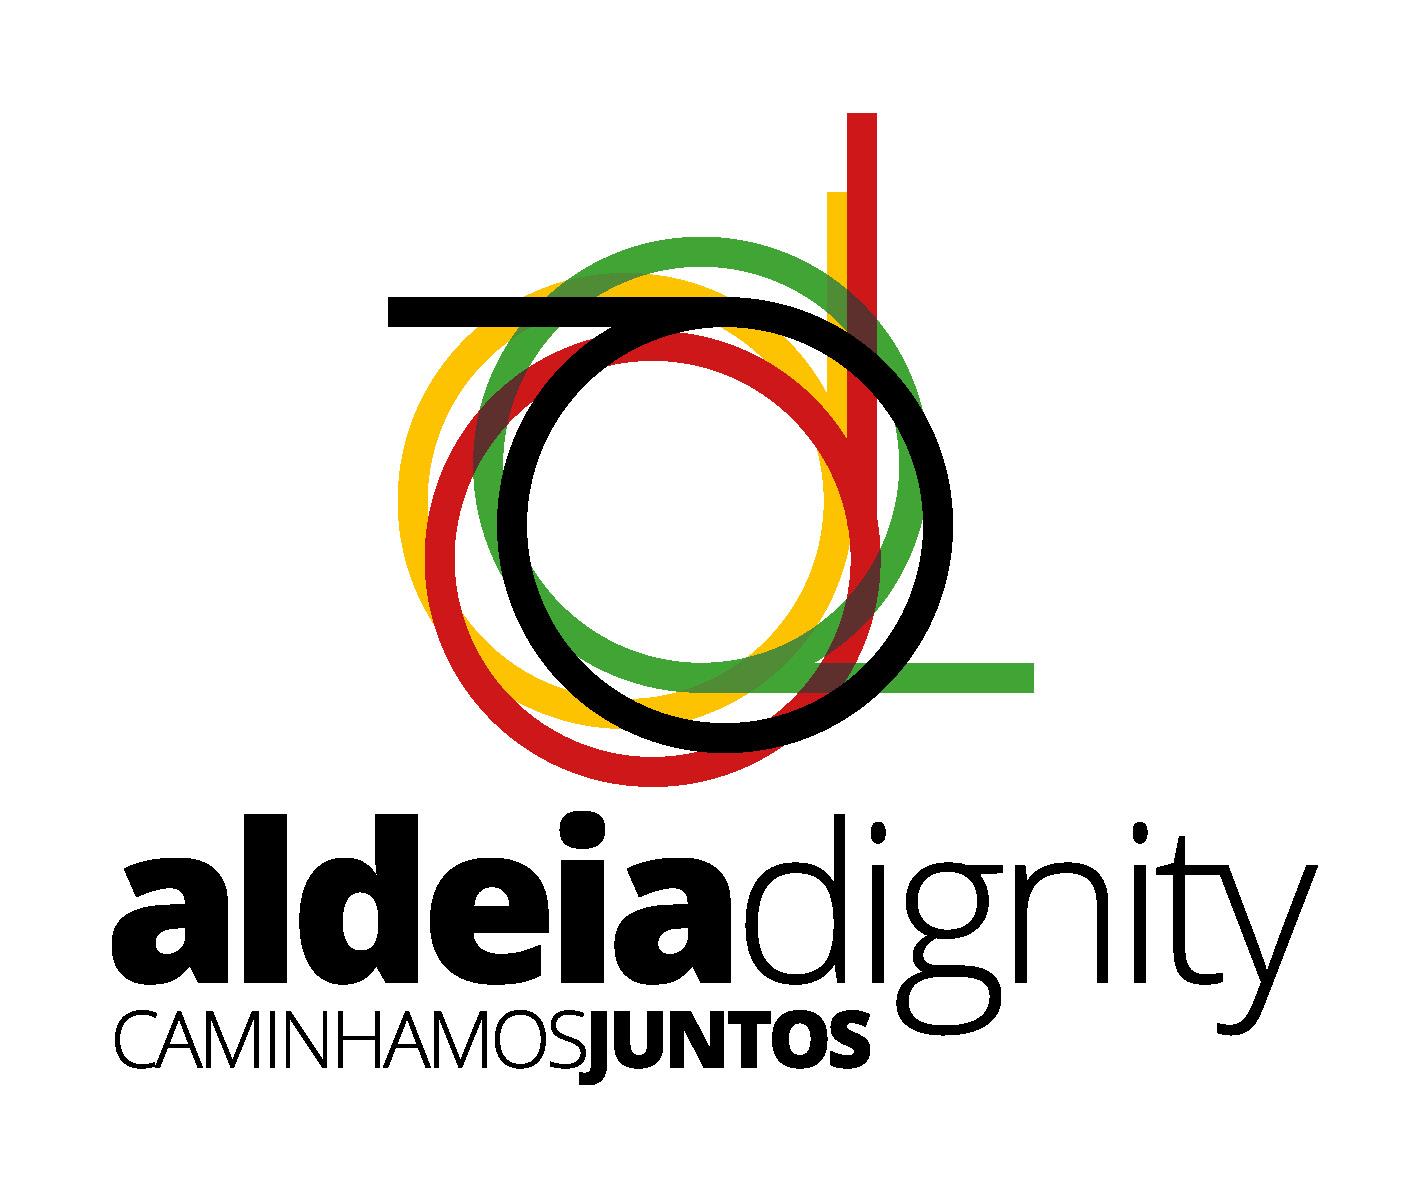 LOGO ALDEIA DIGNITY